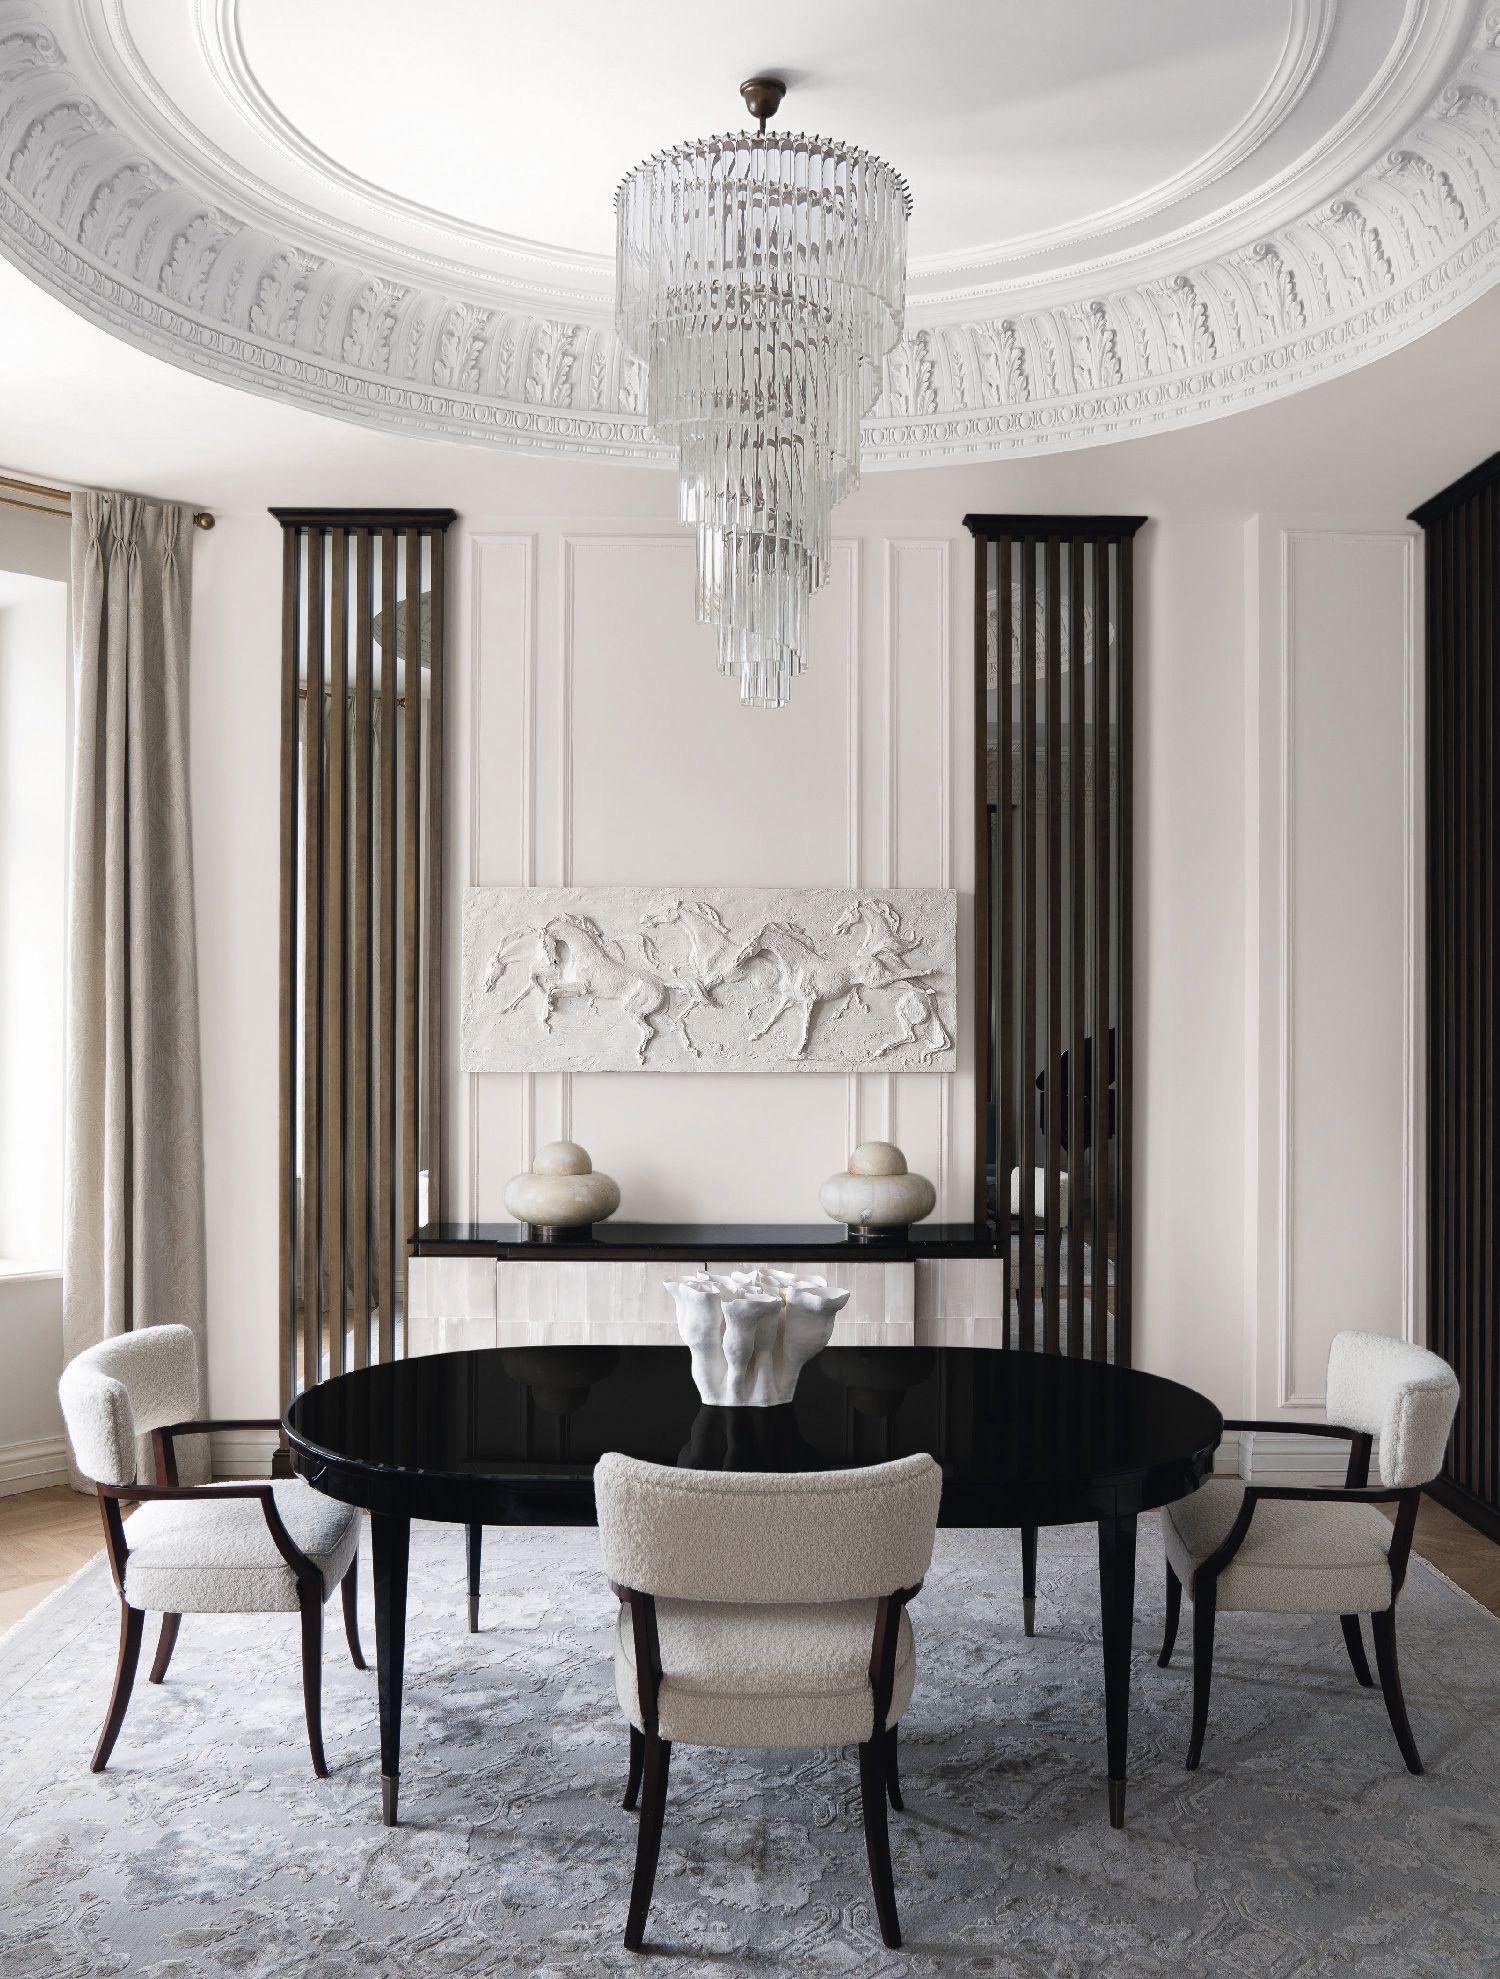 Una Casa A Mosca Tra Classico E Moderno Sala Da Pranzo Lusso Sale Da Pranzo Moderne Idee Di Interior Design